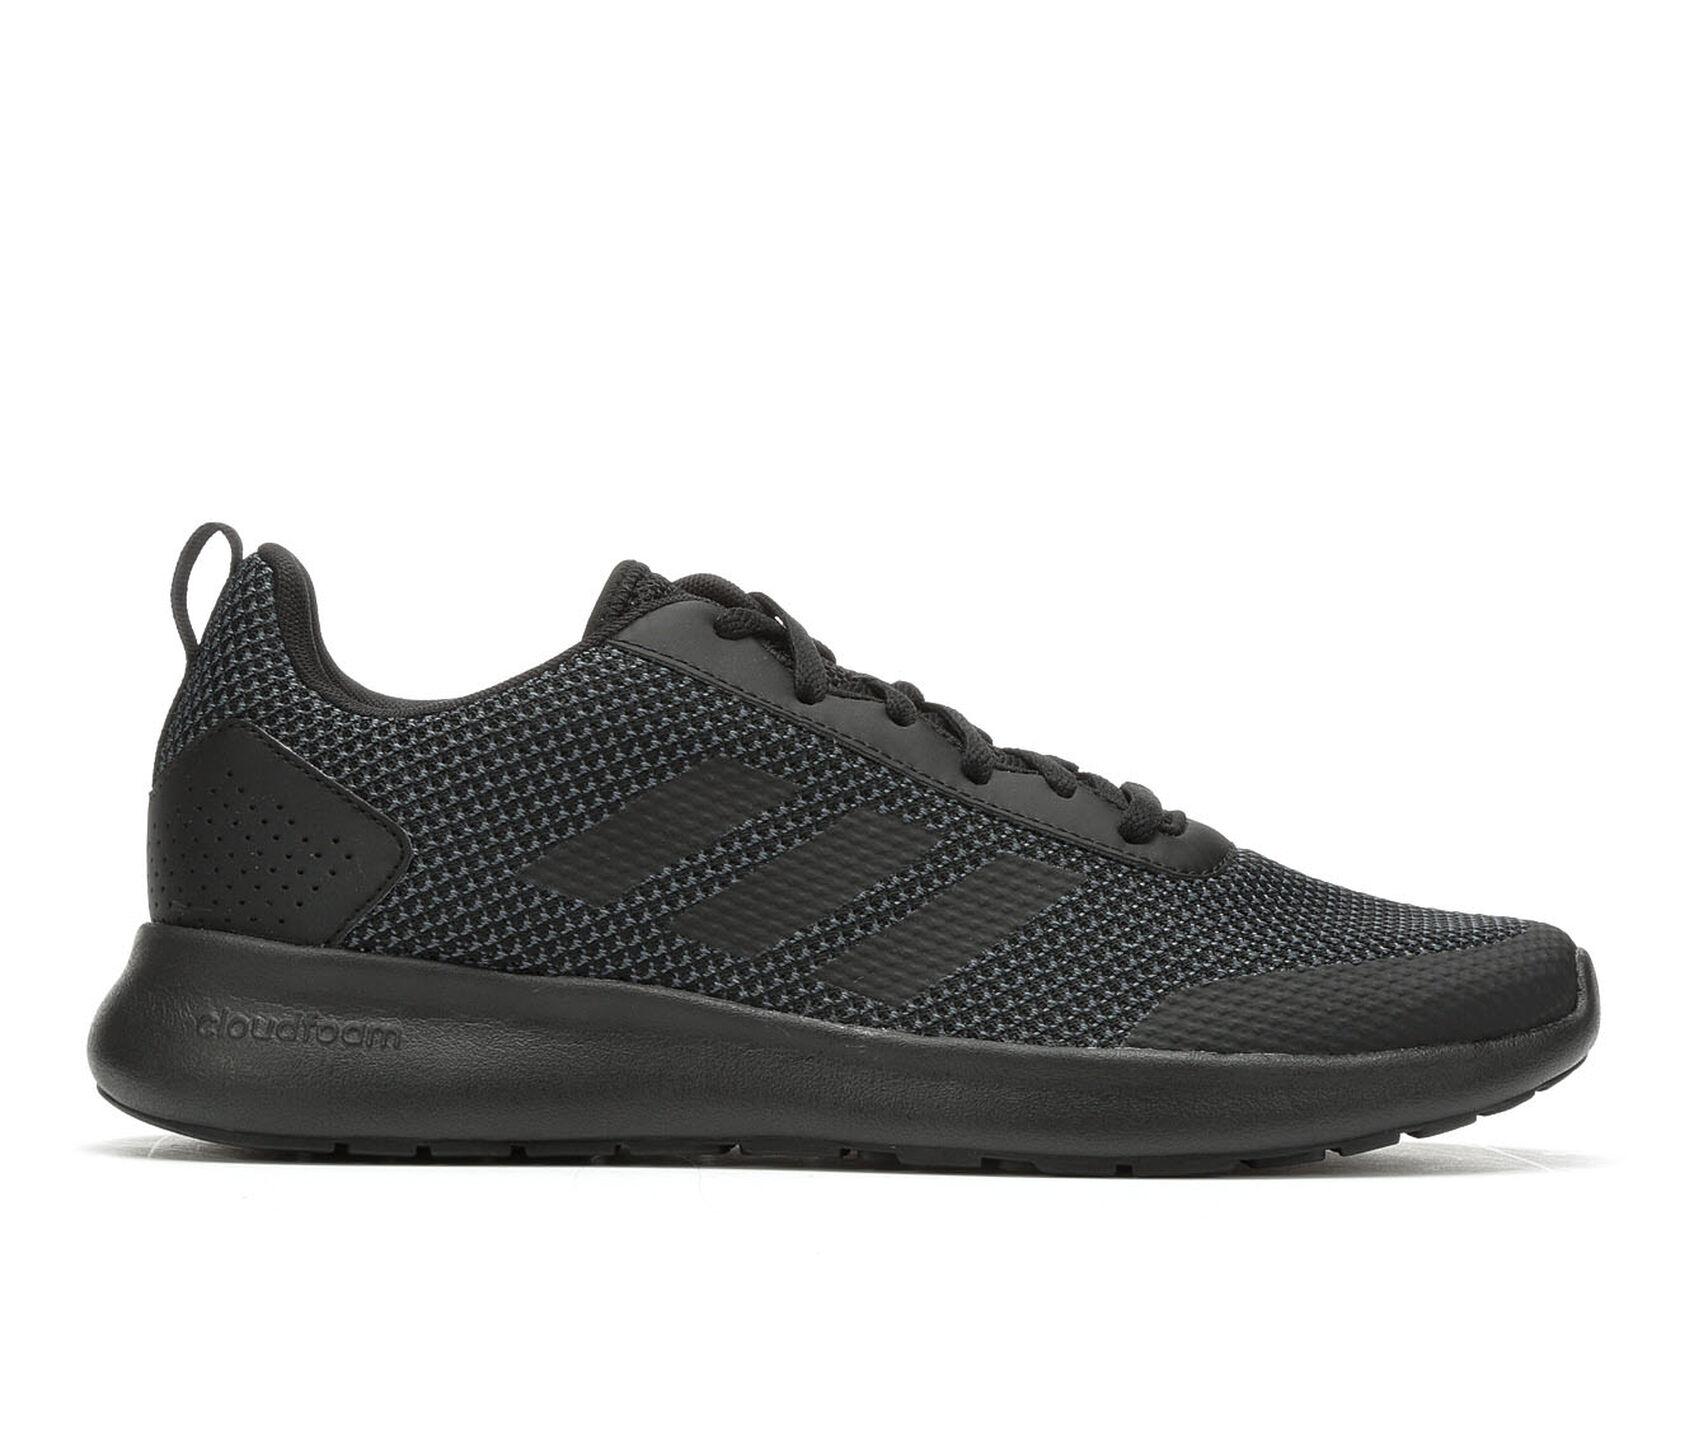 cheaper b0df7 f9191 Men's Adidas Cloudfoam Element Race Running Shoes